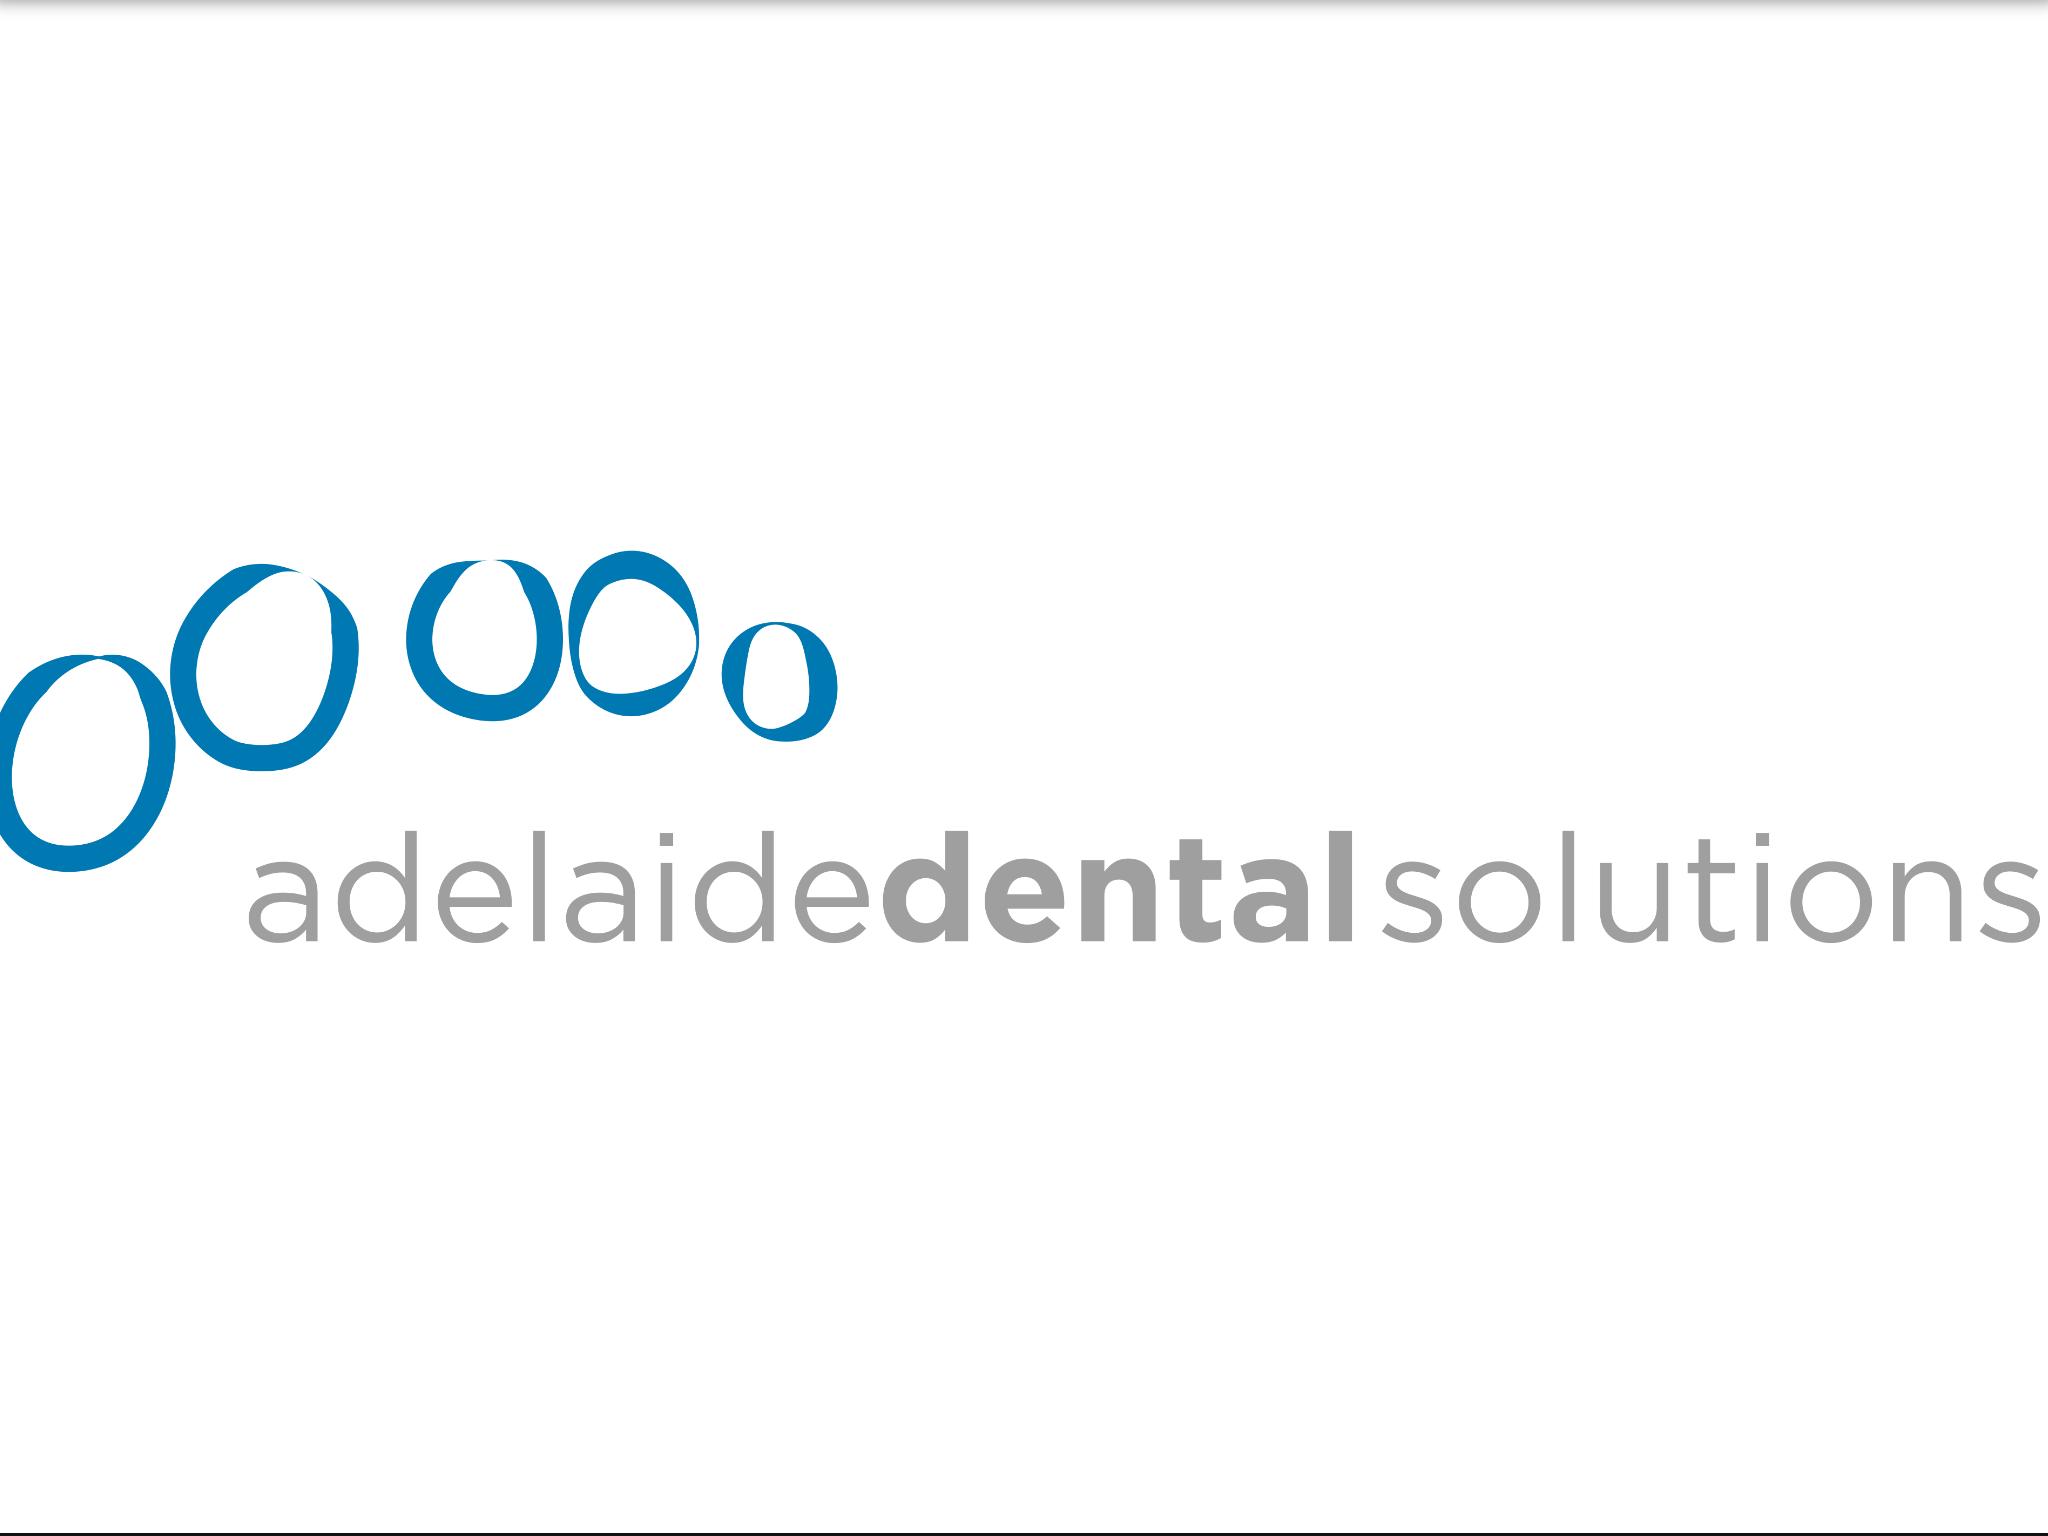 Adelaide Dental Solutions